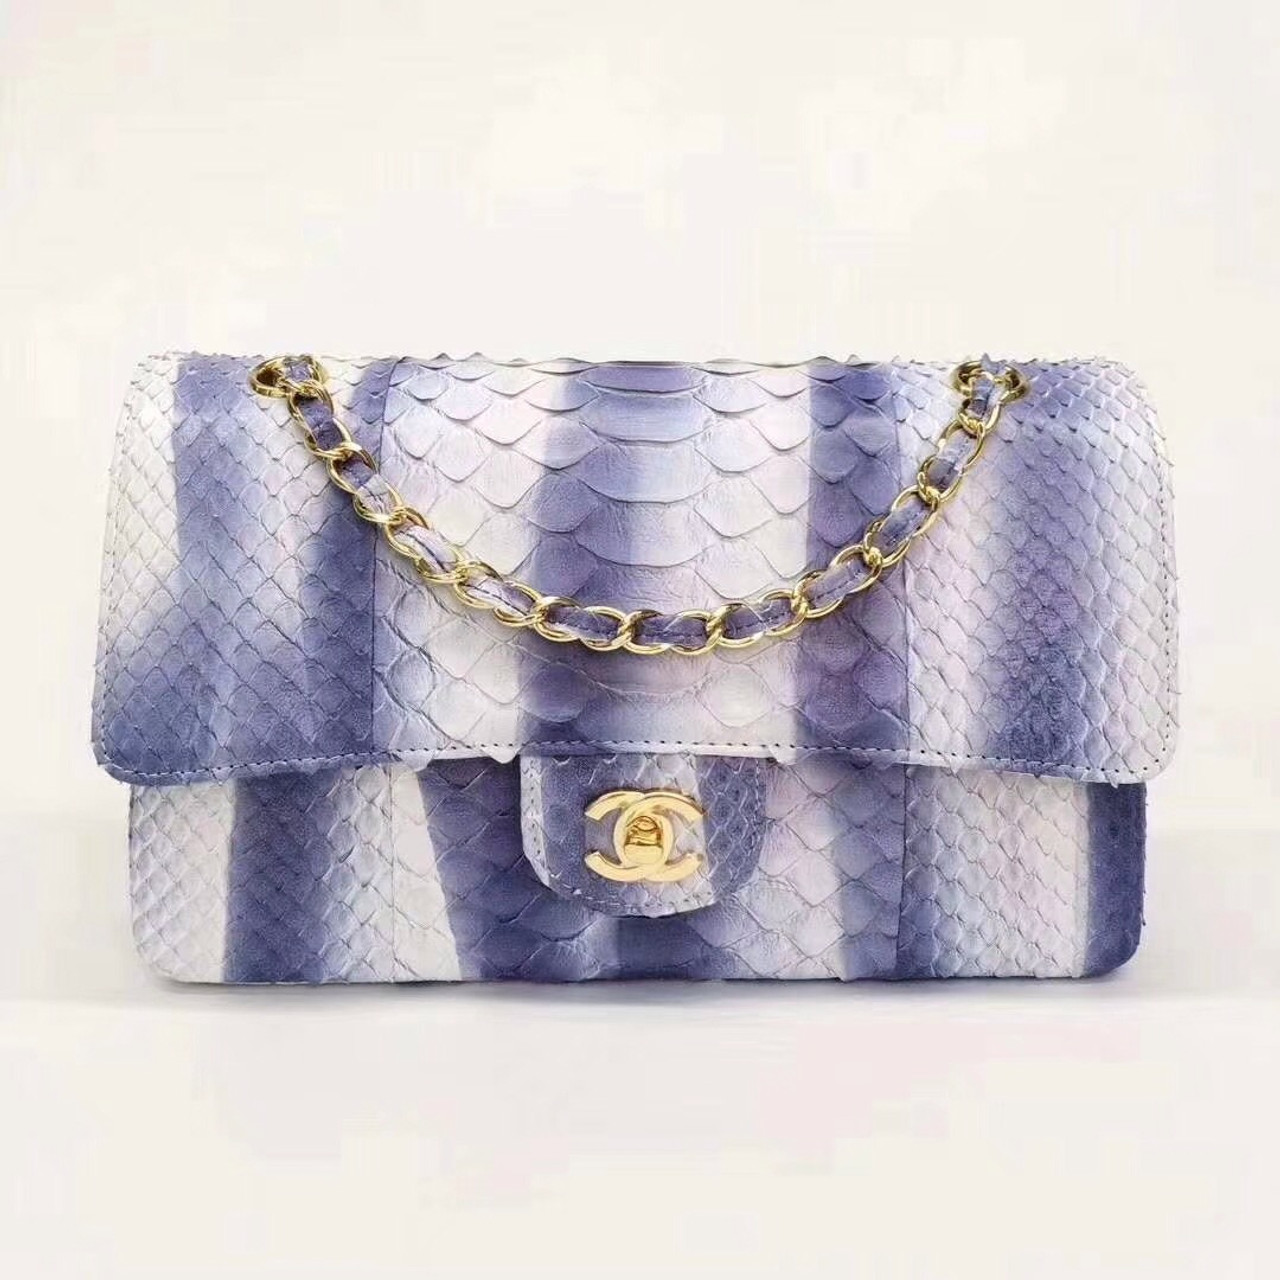 7bec64cb3494 Chanel Python Classic Handbag Navy Blue - Bella Vita Moda